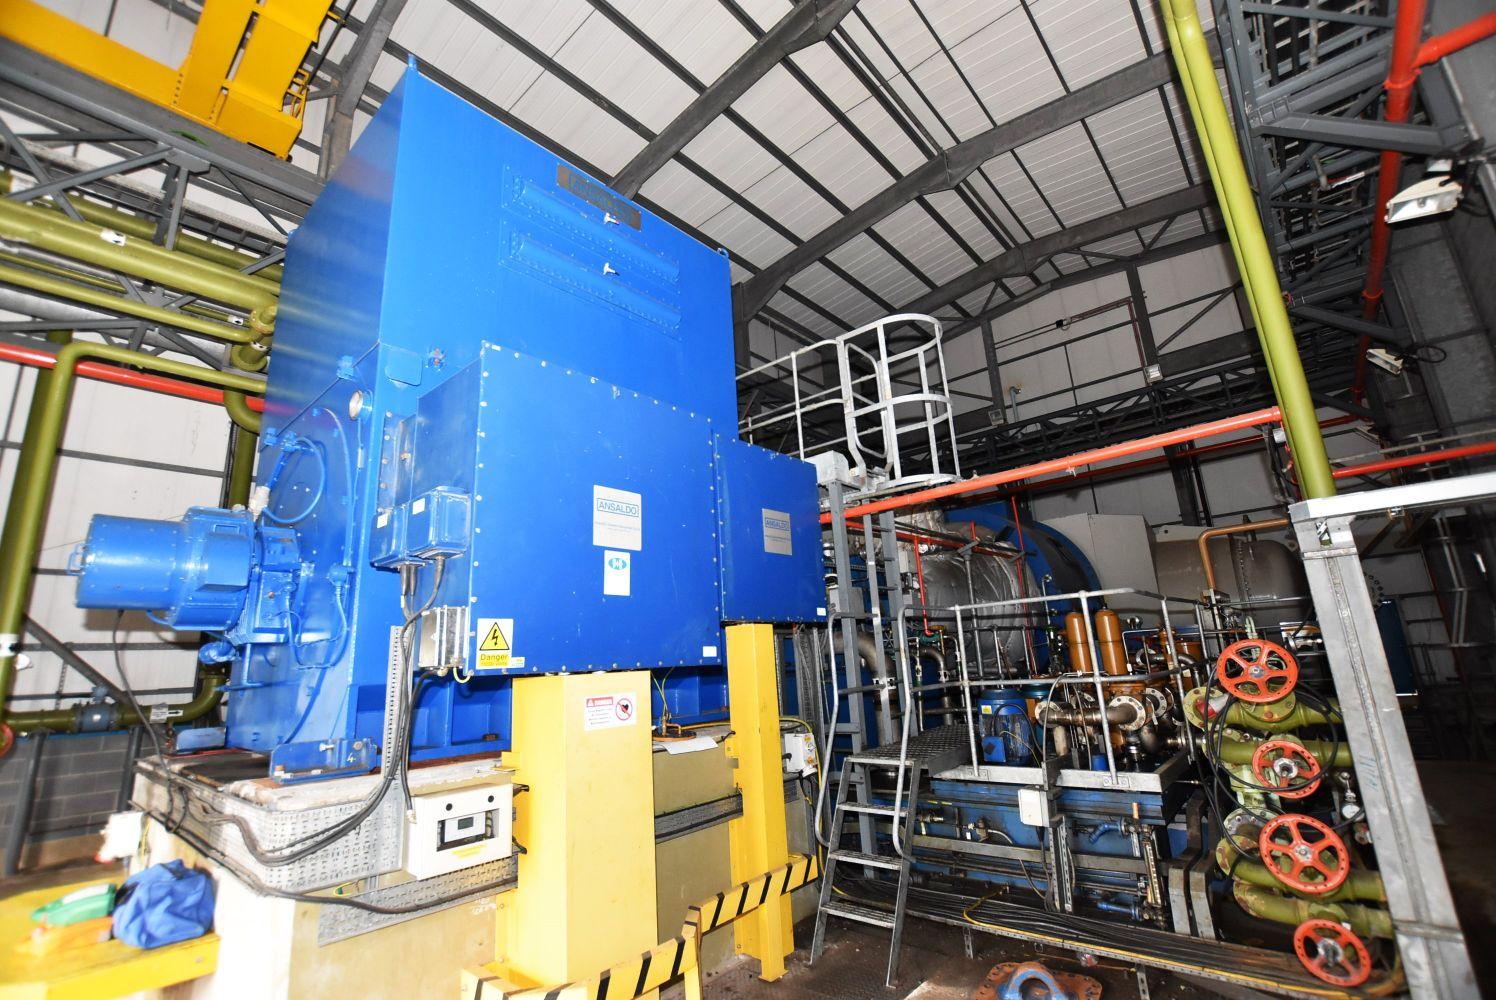 Steam Turbine Generator, Portal Framed Building, Overhead Crane and Associated Power Plant Generation Equipment